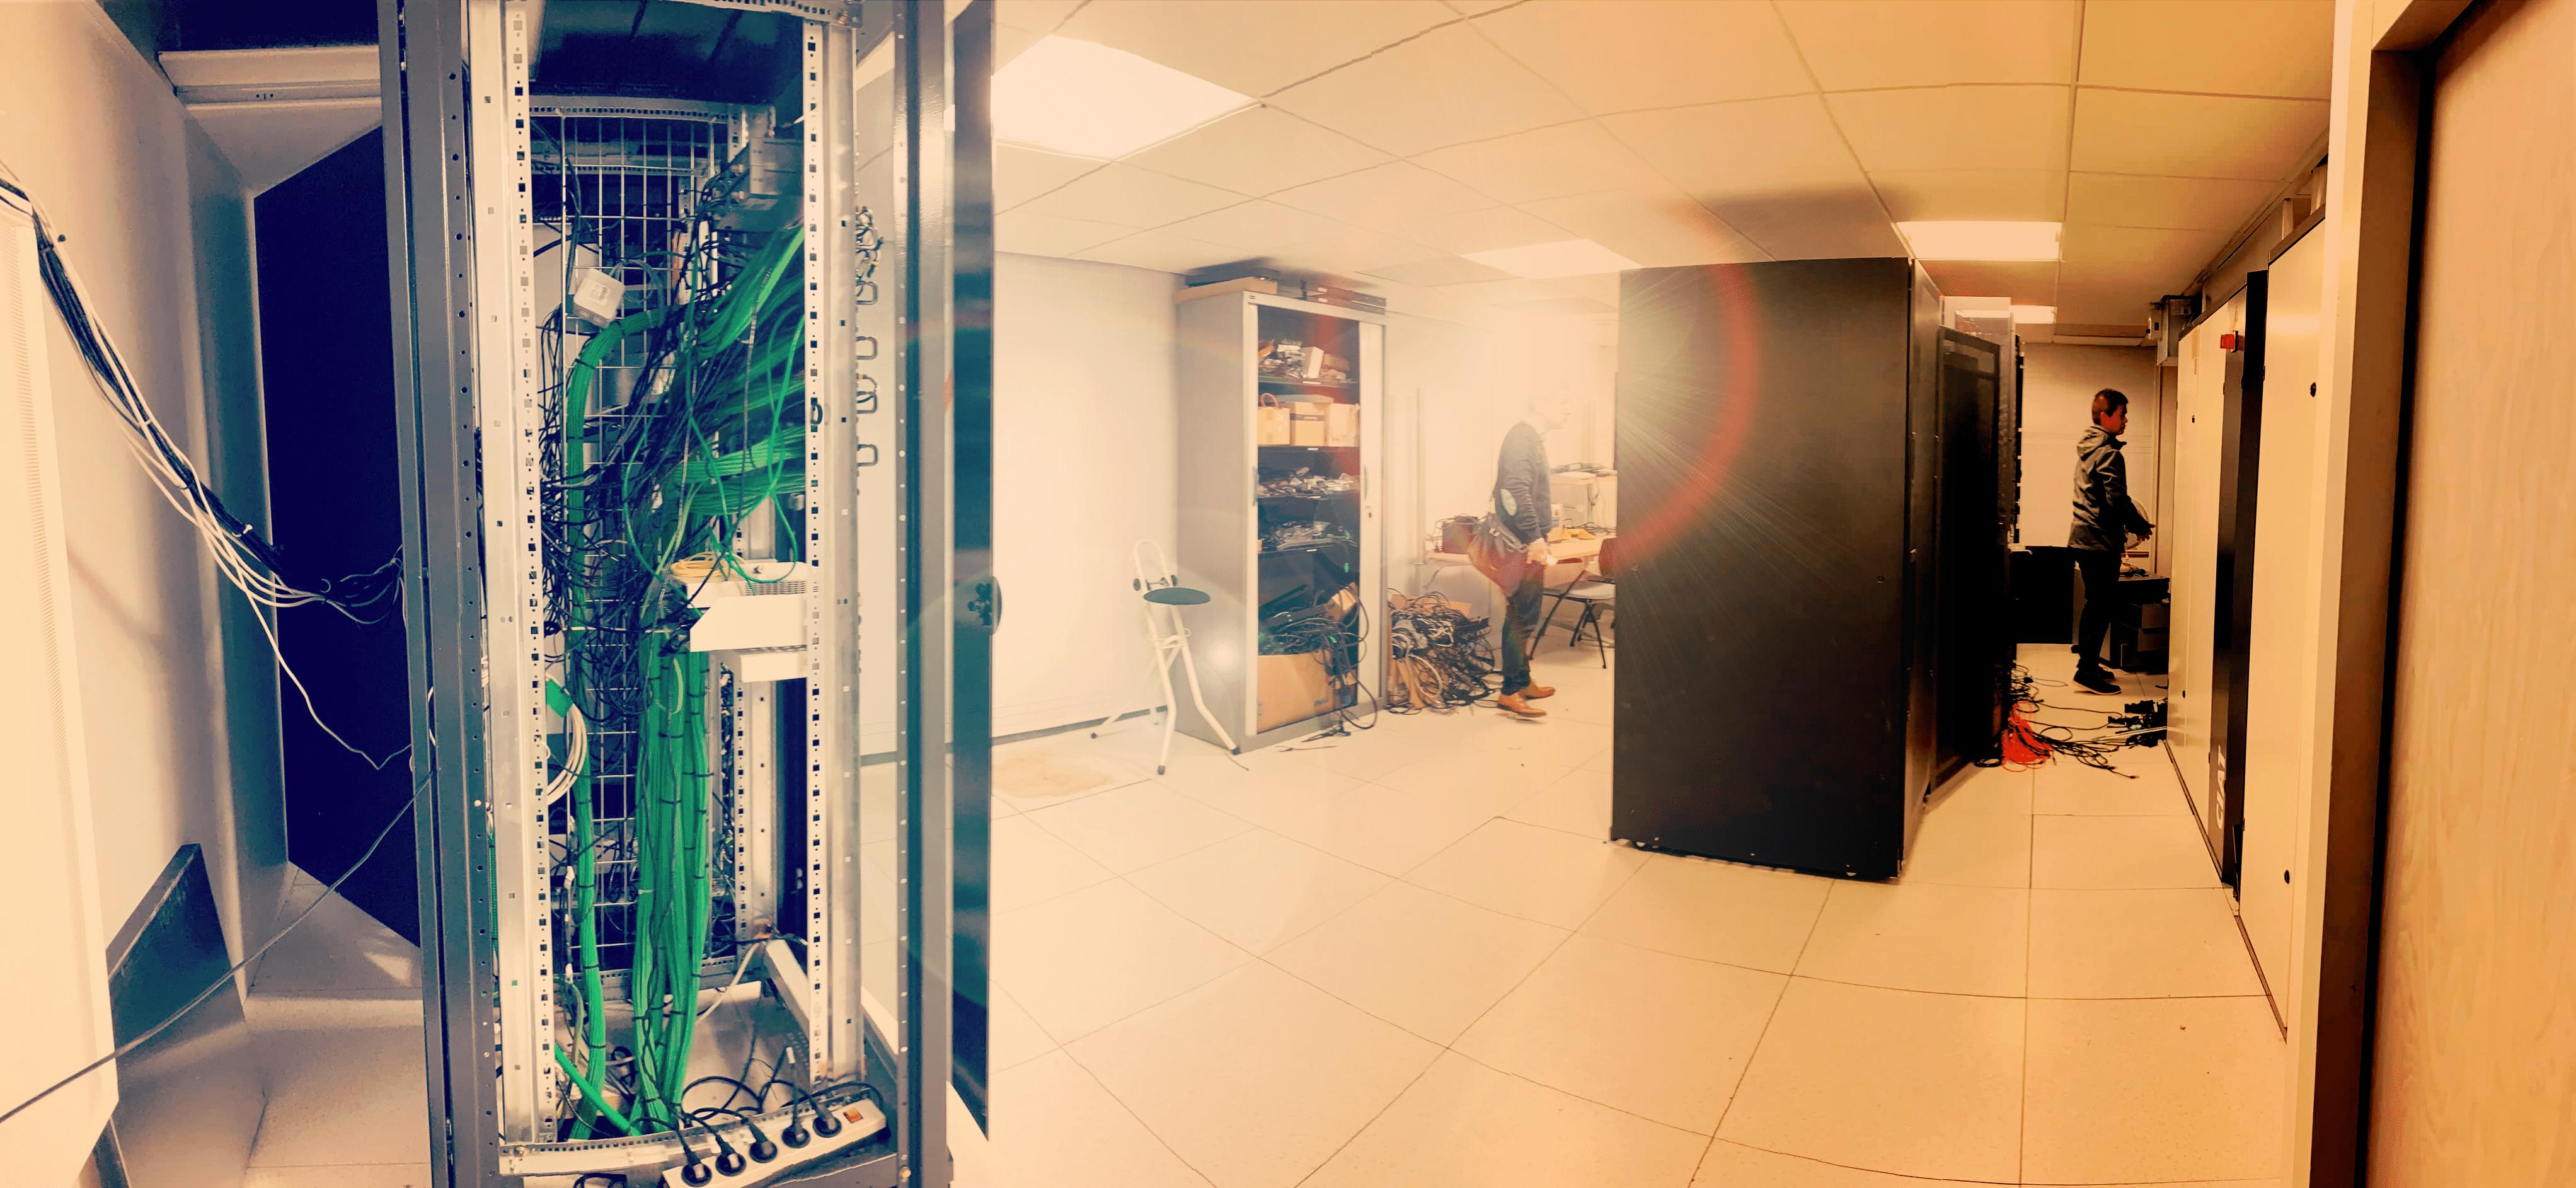 salle IT avant